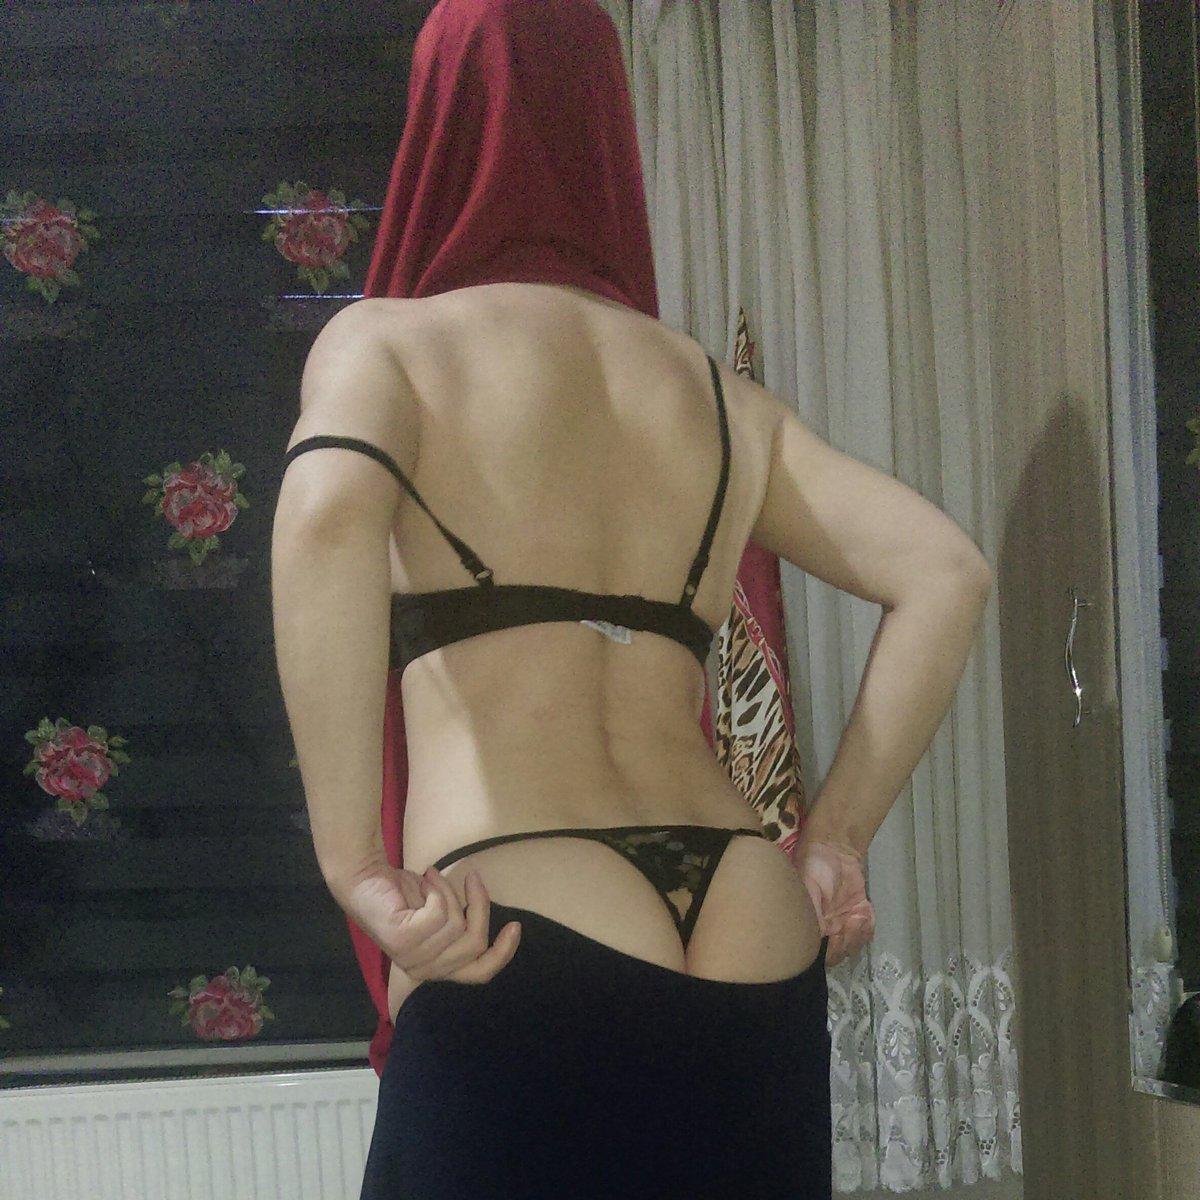 589384c77a185 - سكس - افلام سكس عربي و اجنبي مترجم | arab sex porn